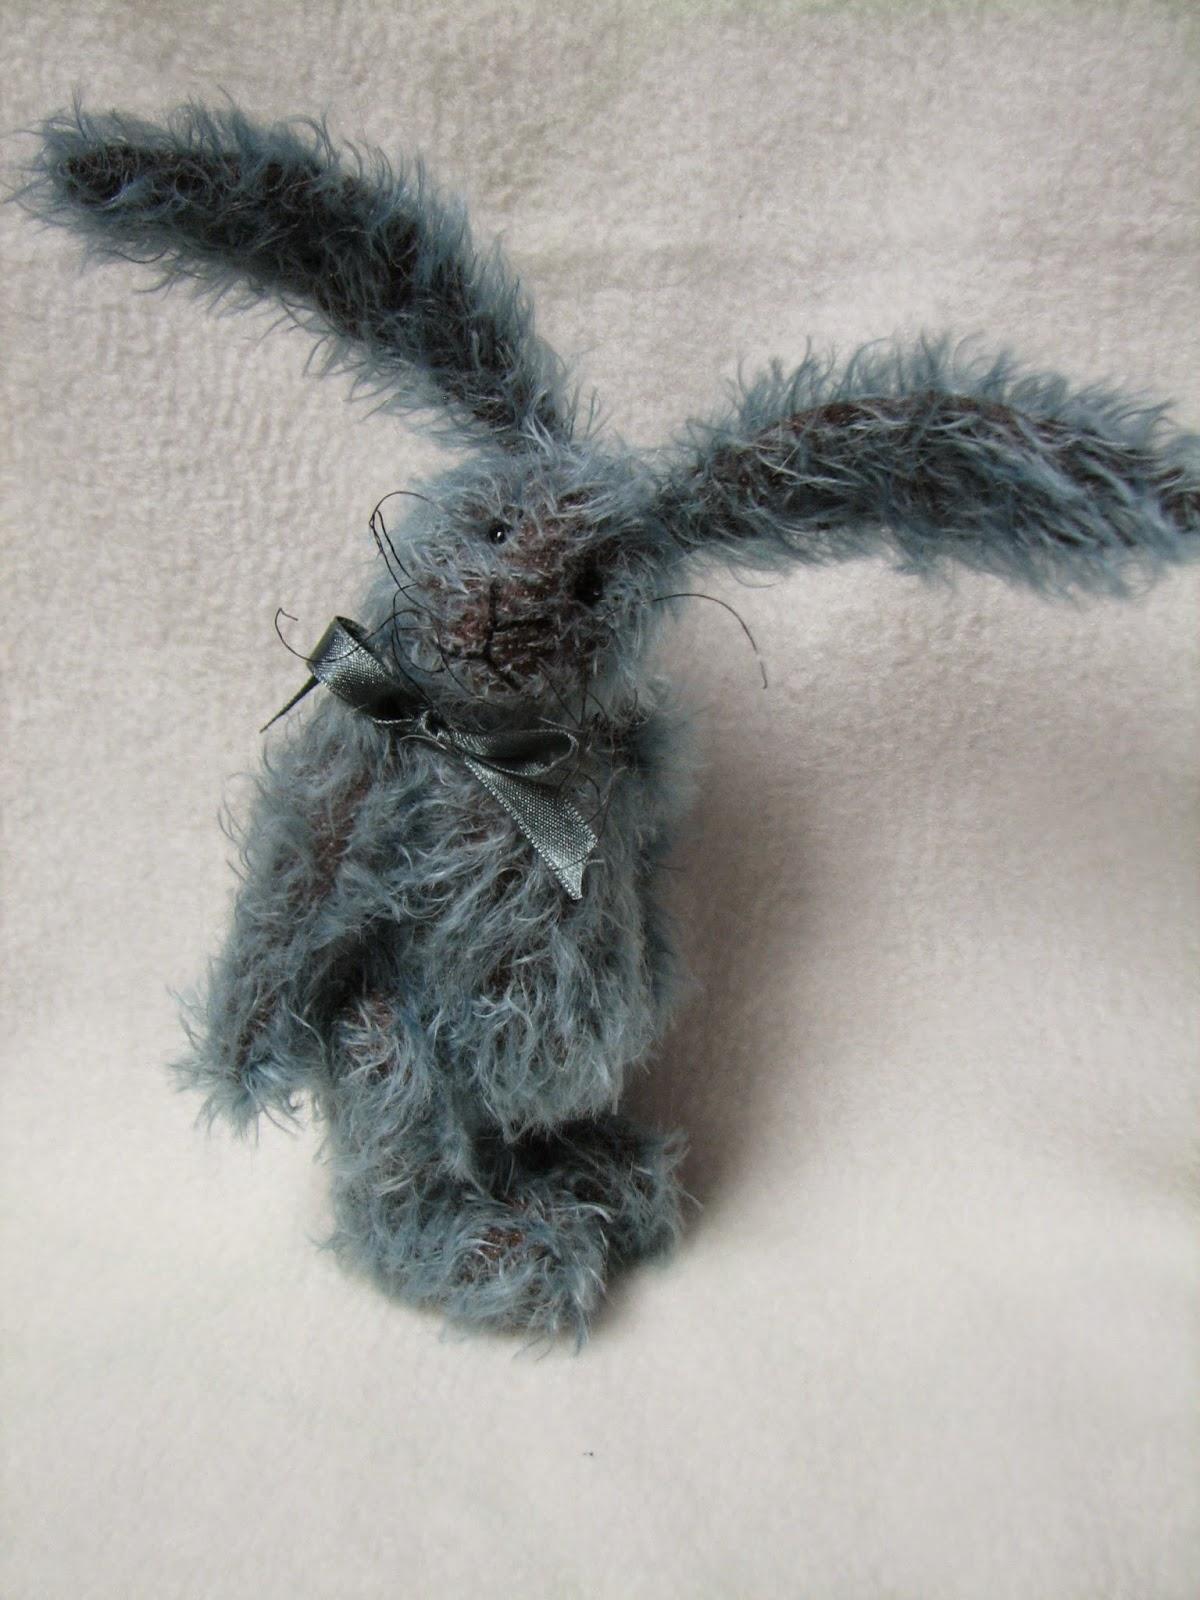 http://artistbearsinternational.com/en/auction/849-eli-bunny.html